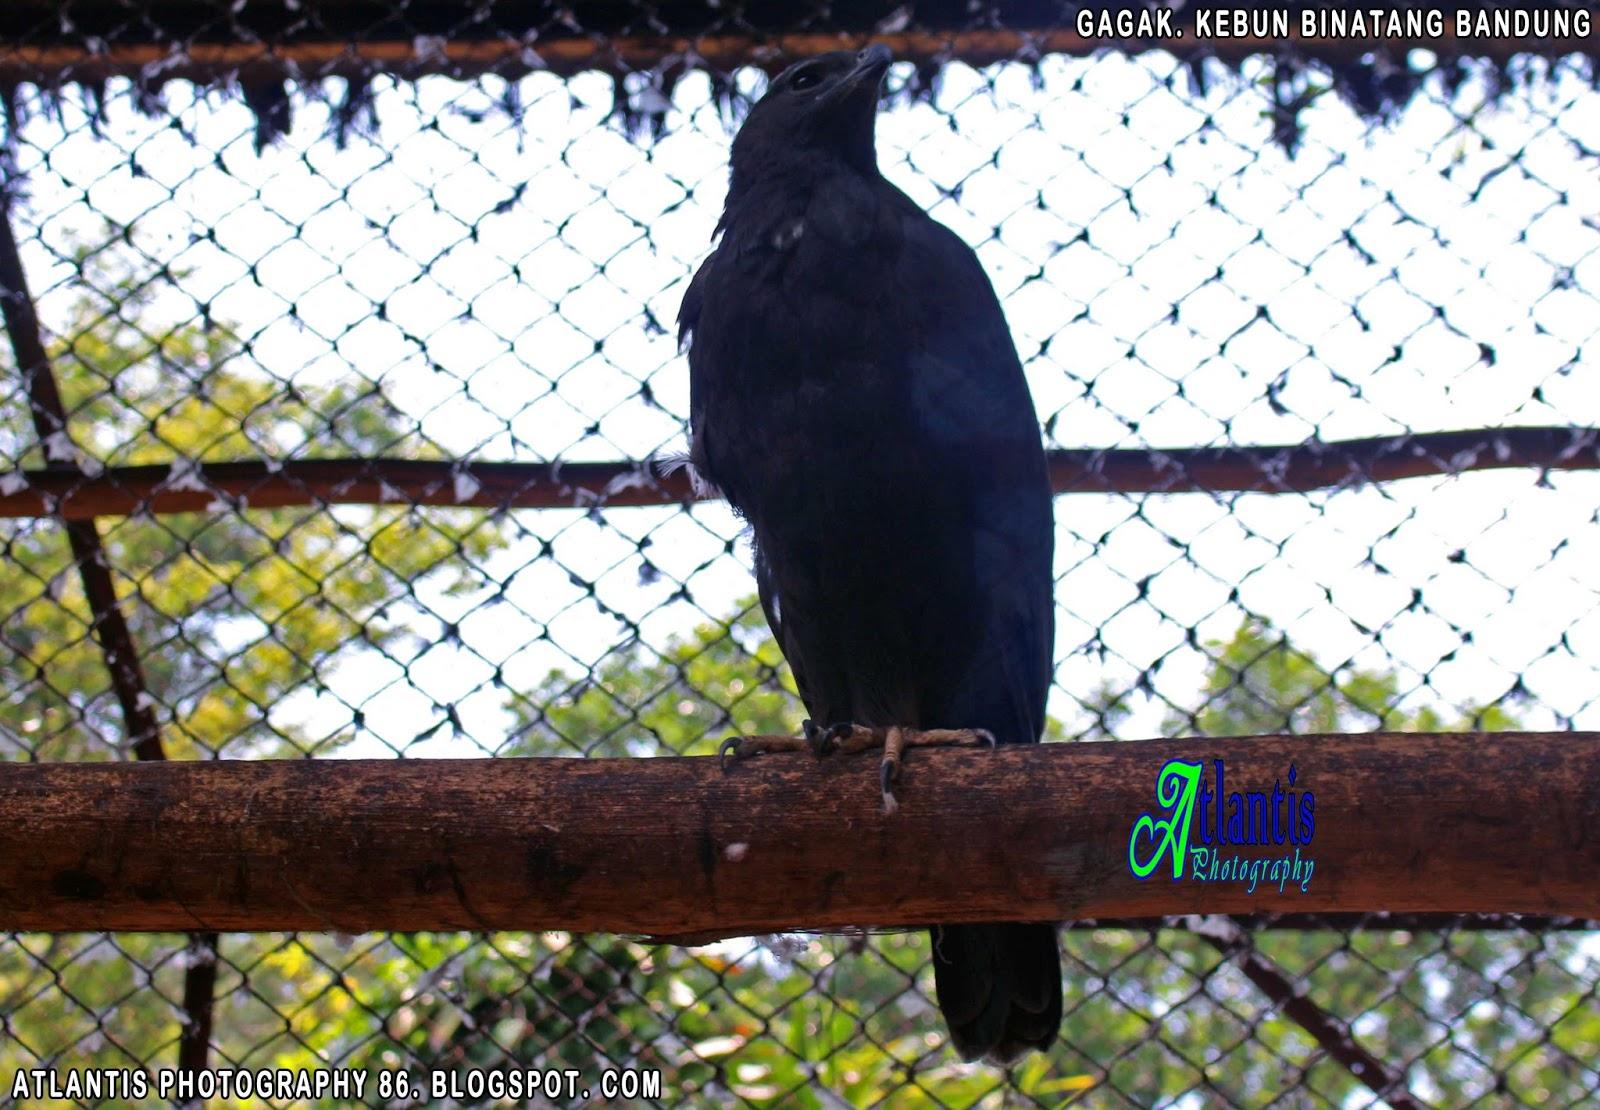 Atlantis Photography Krui Bandung Zoo Kebun Binatang Terdapat Segala Macam